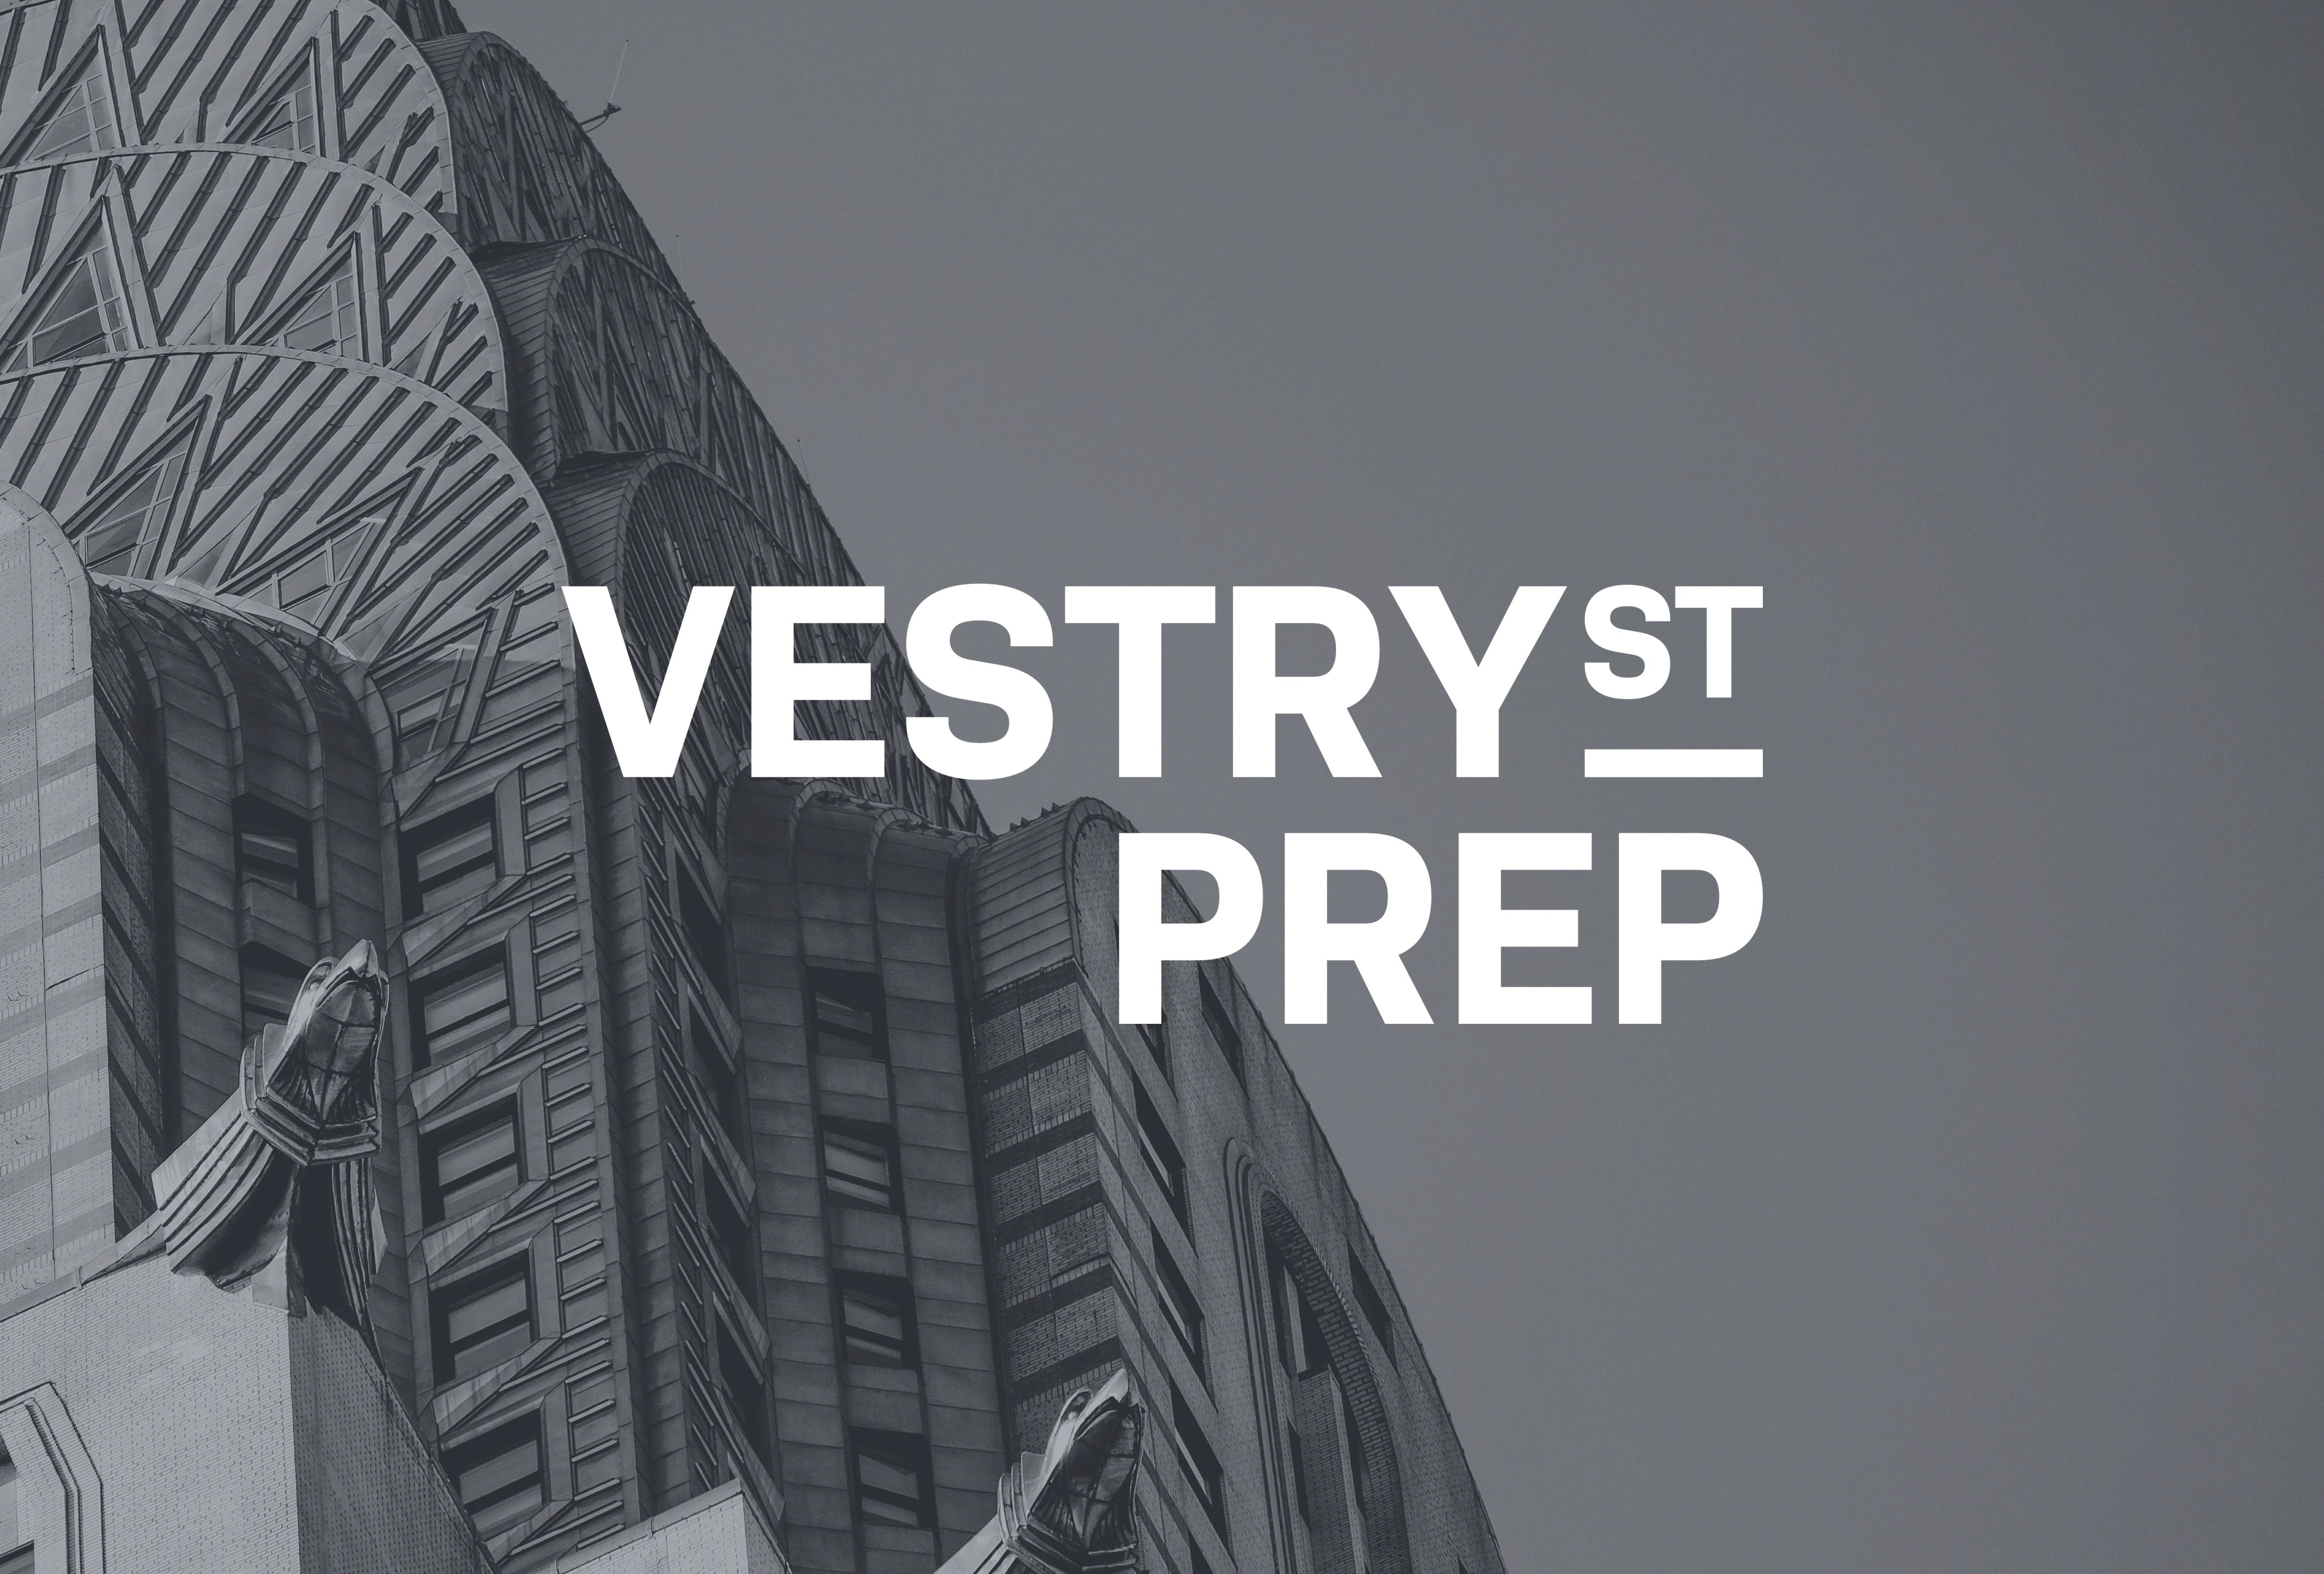 Vestry Street Prep - Lovably